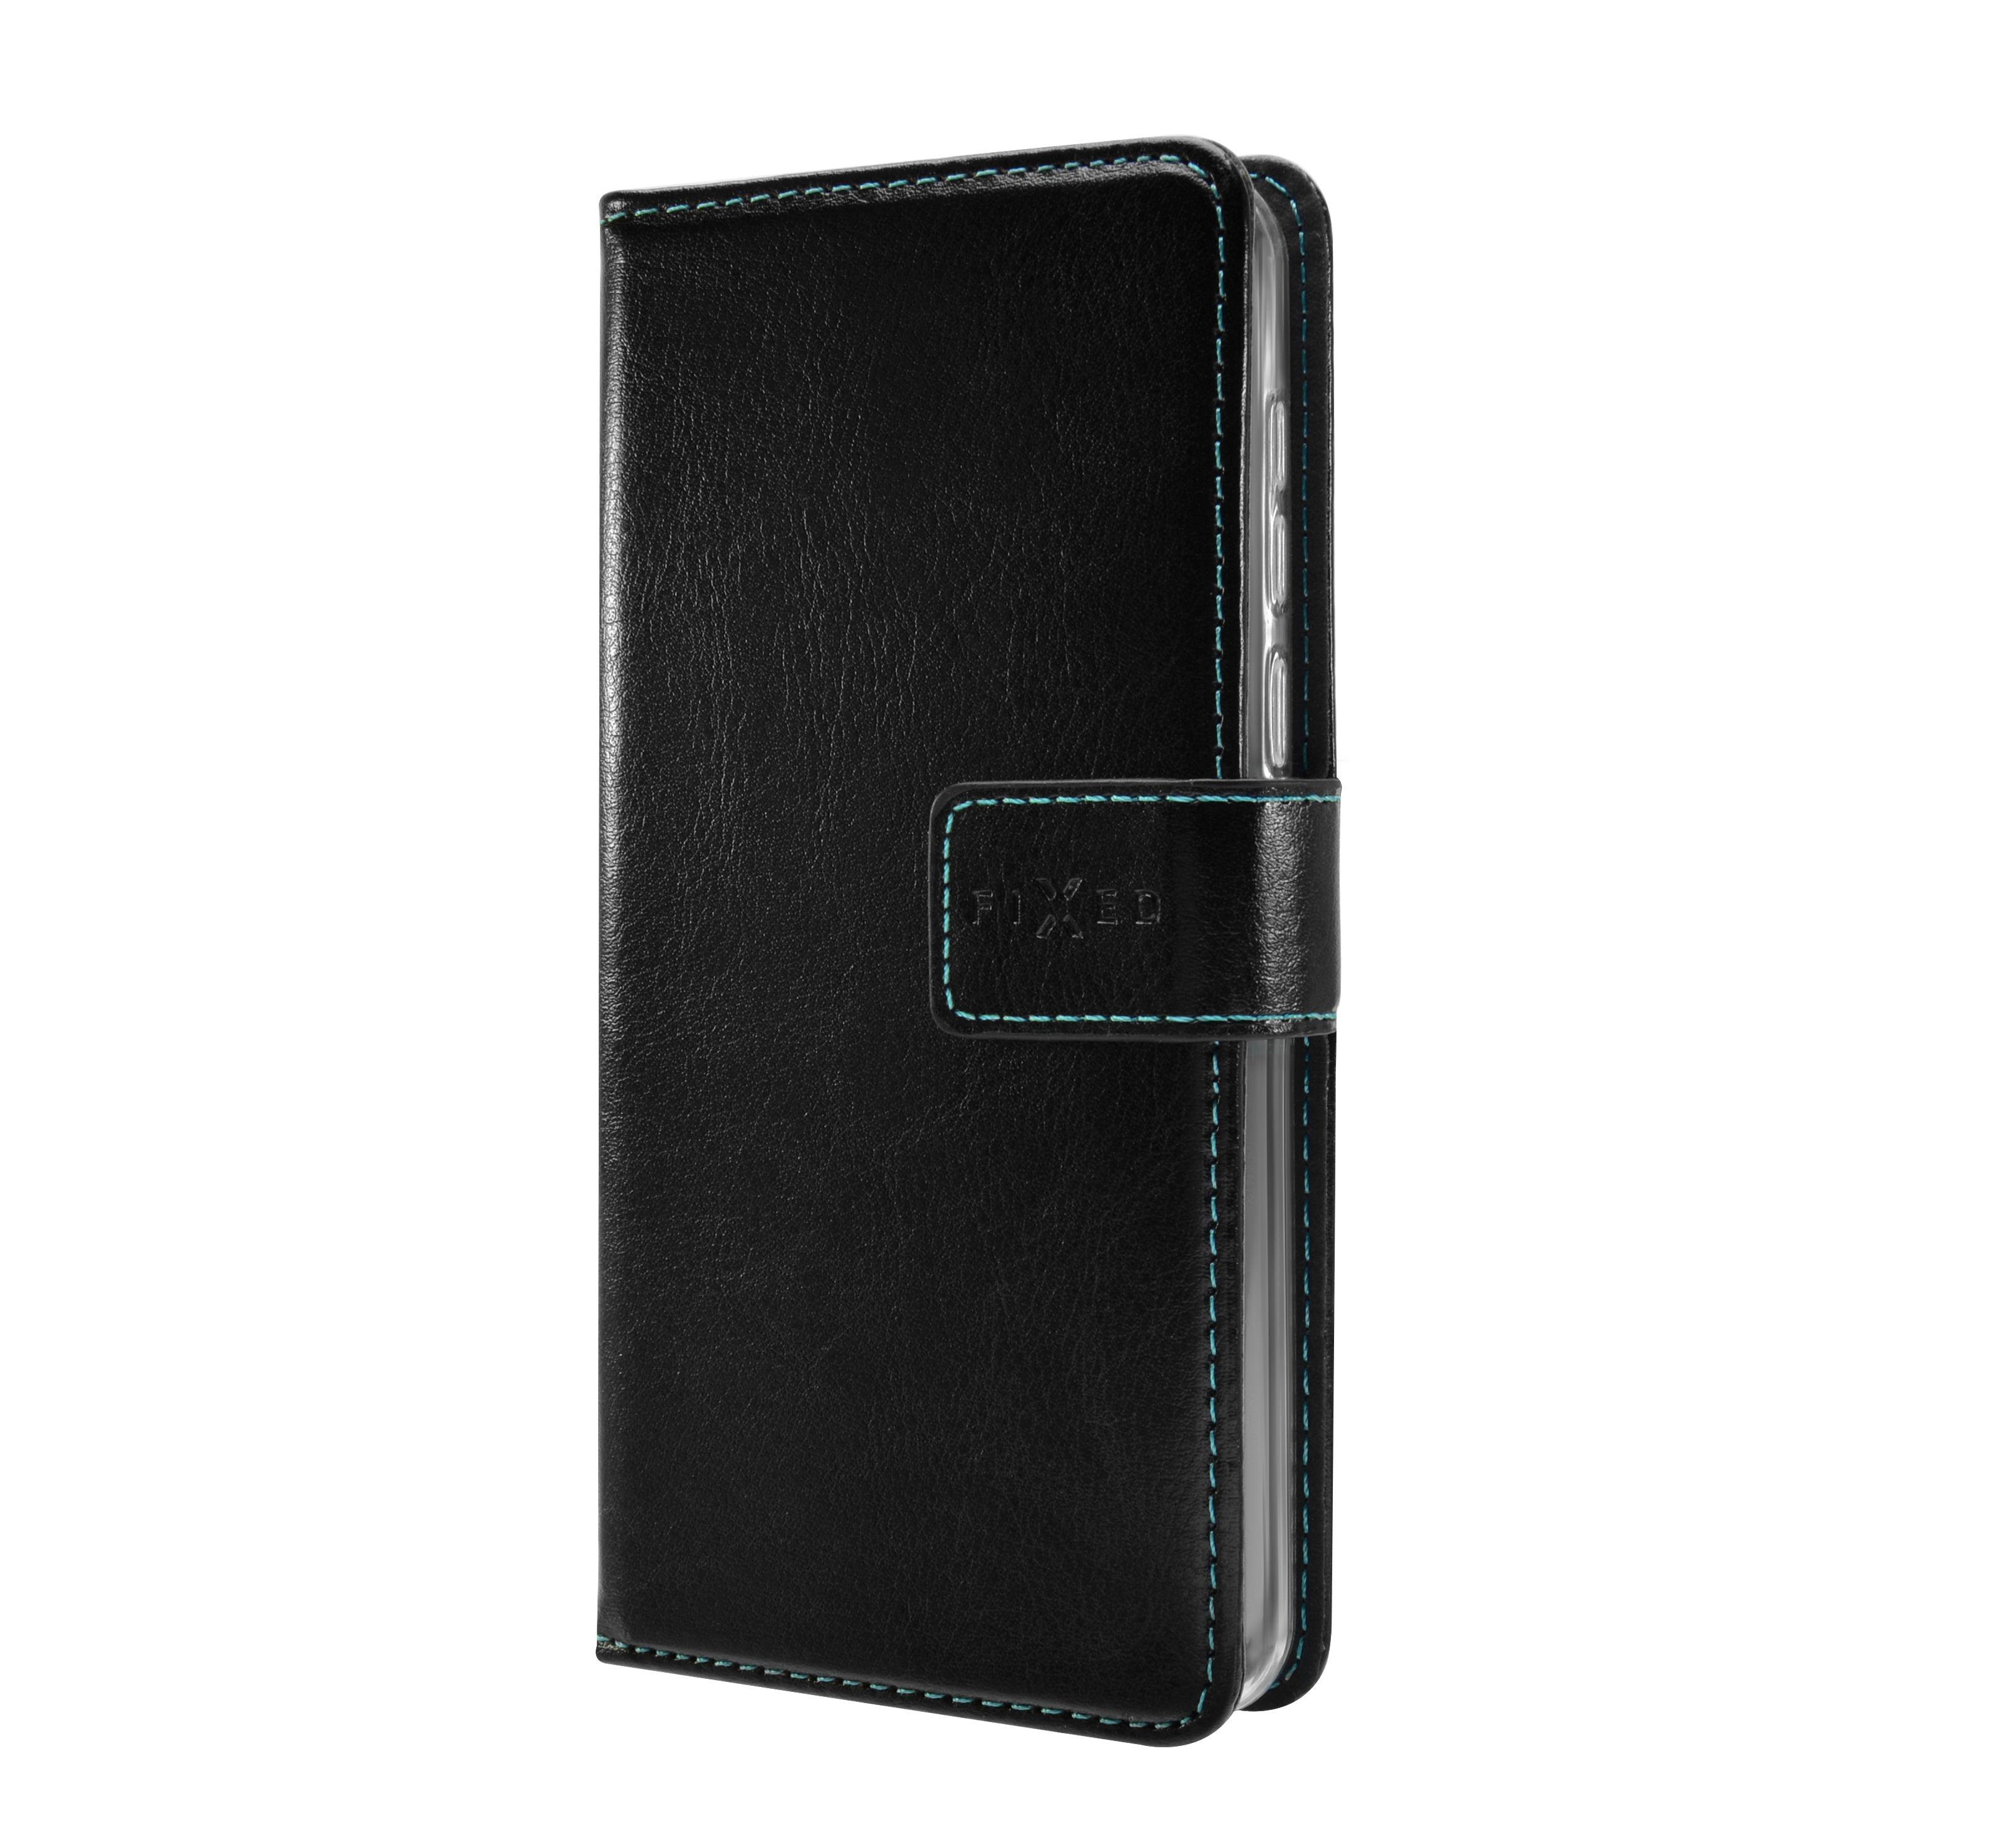 Pouzdro typu kniha FIXED Opus pro Asus Zenfone Max Pro M2 (ZB631KL), černé